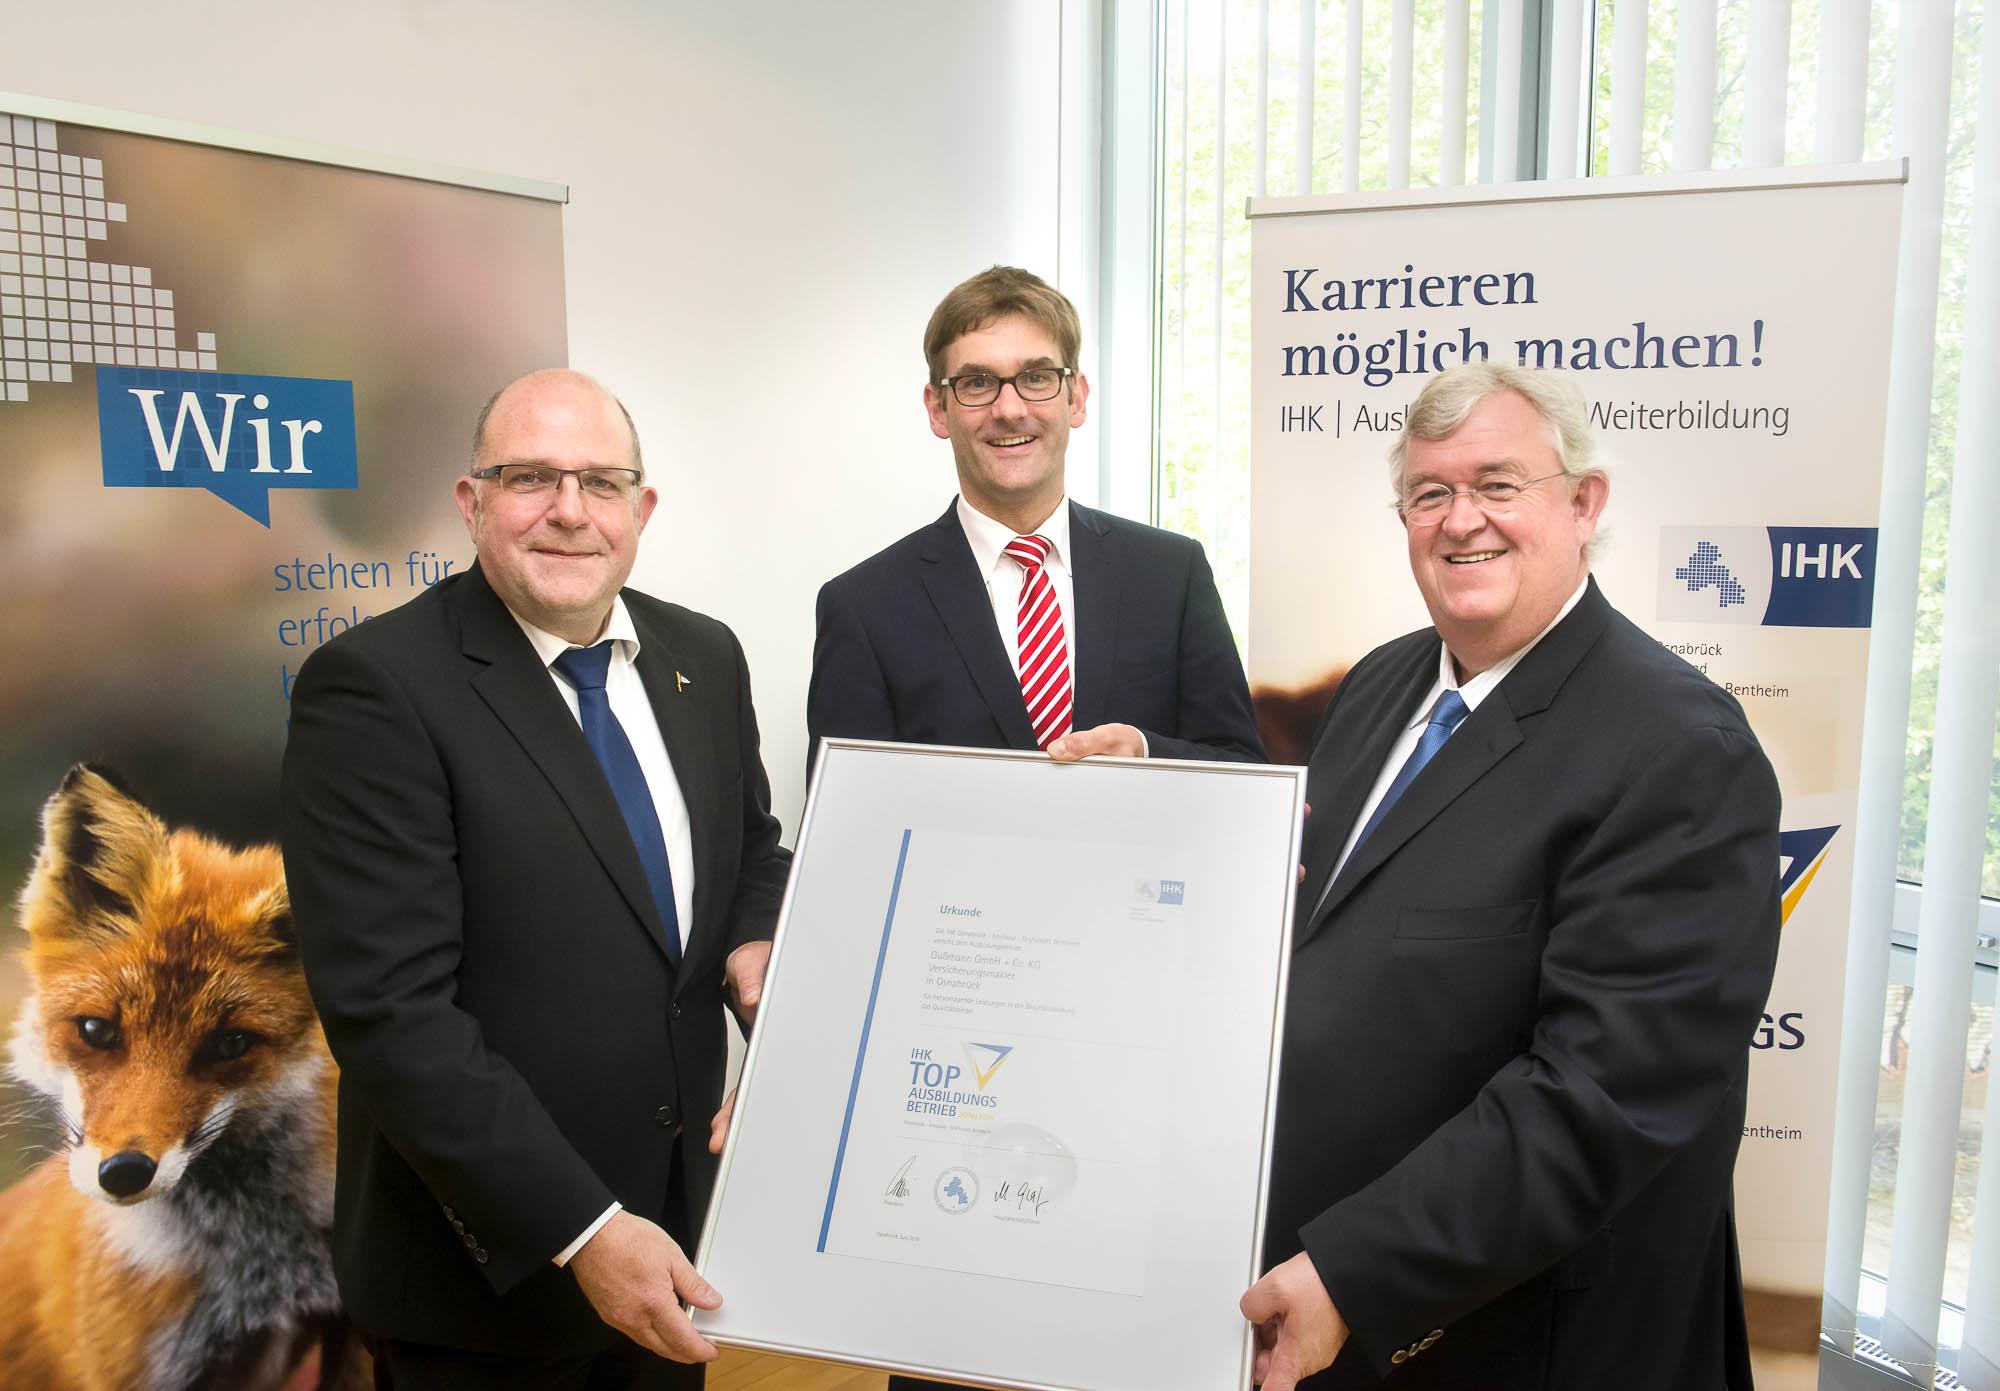 Martin Schlichter, IHK President, Bodo Gußmann and Jörg Holtgrefe, Gußmann GmbH + Co. KG (from right).